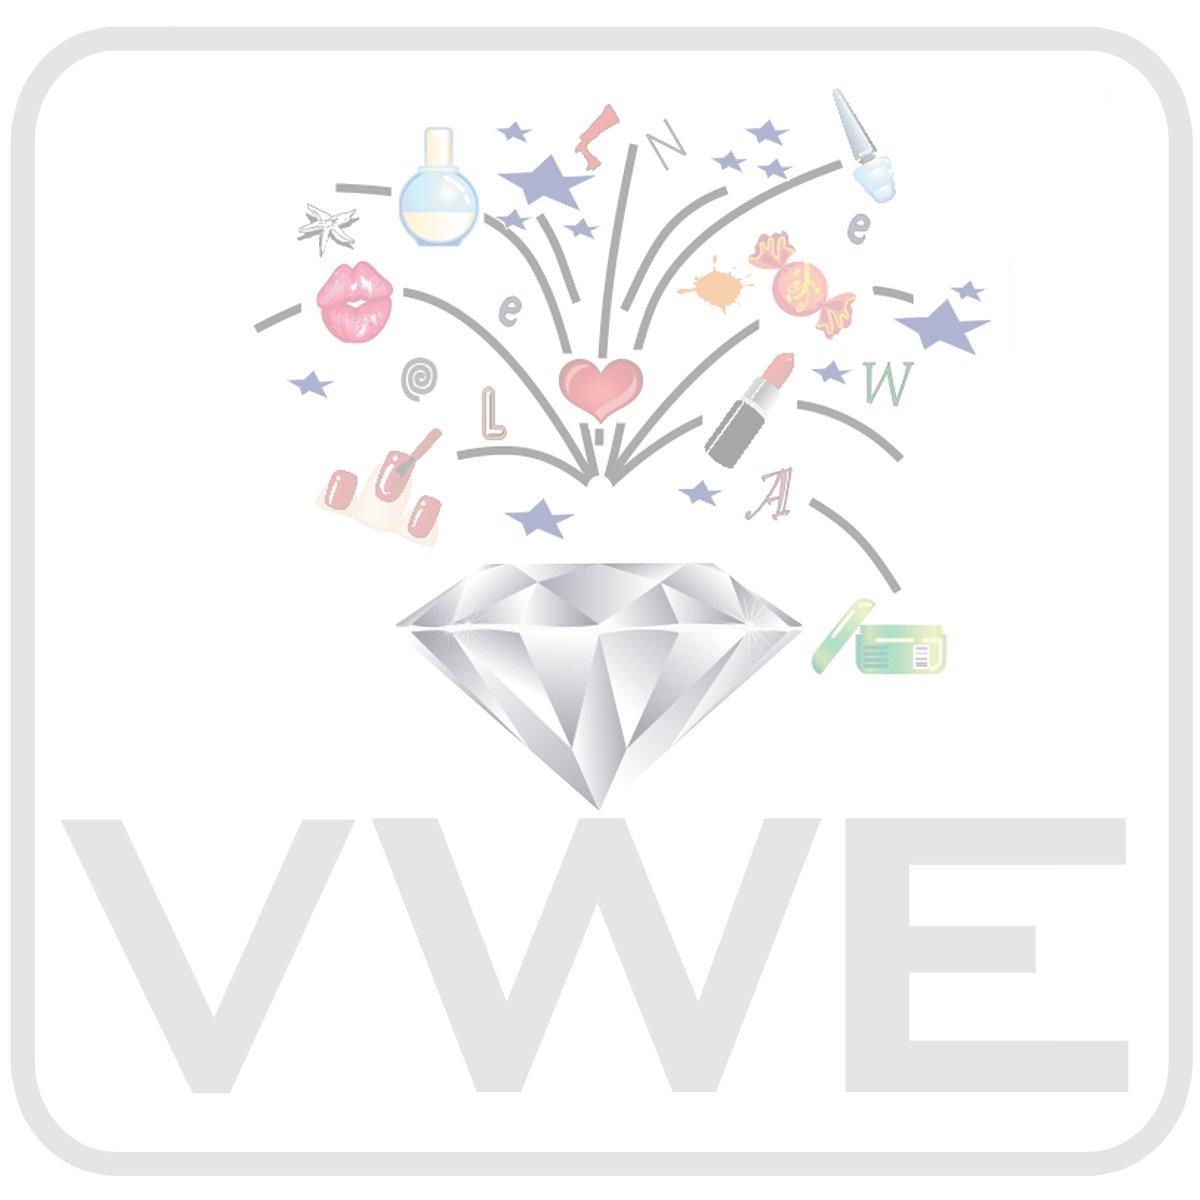 UV Gel Flux Diamond Touch - GFDT15-XS - 5ml  [2 / 3]